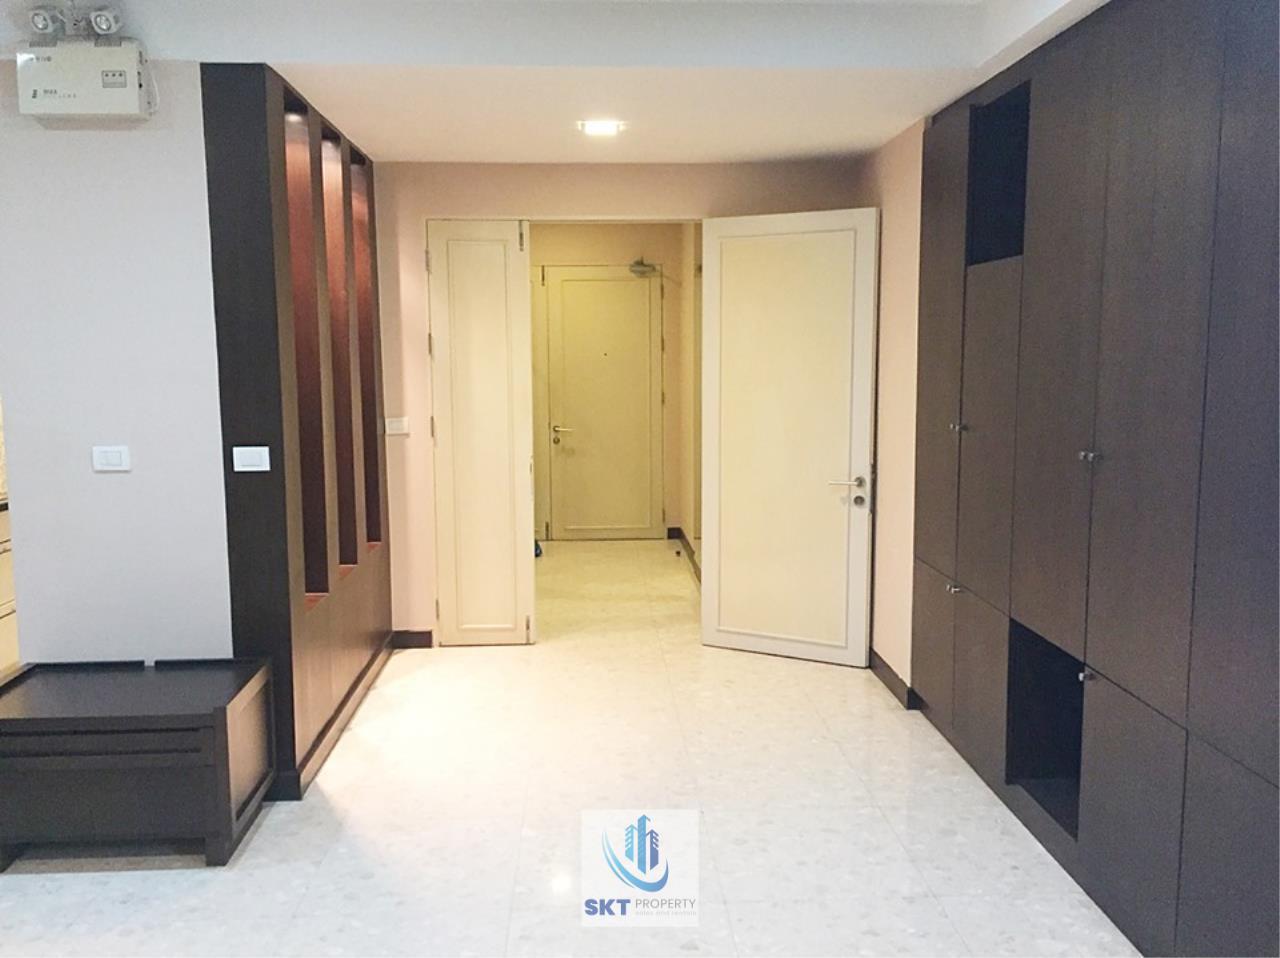 Sukritta Property Agency's Nusasiri grand condo neat BTS Ekamai 10